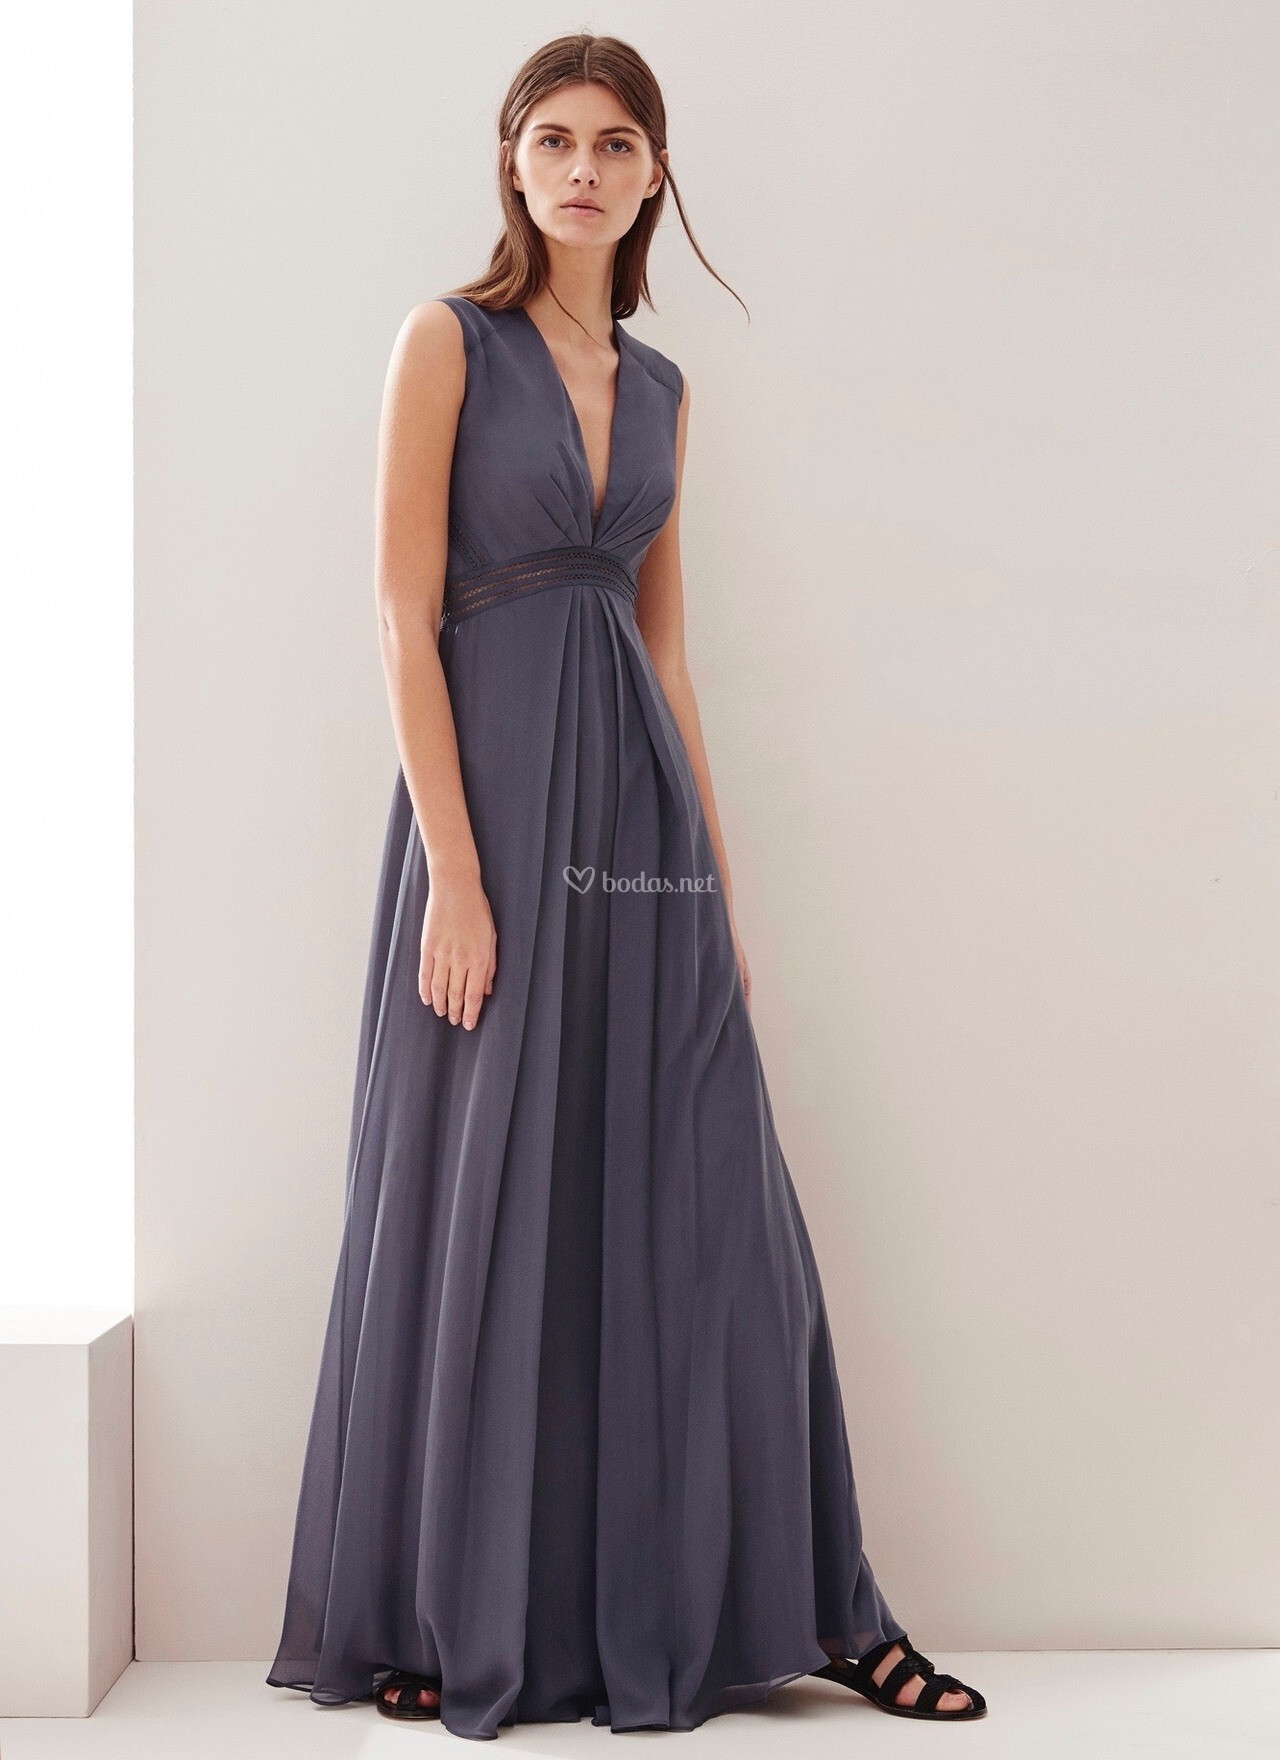 Vestido de fiesta de adolfo dom nguez 293165234161 for Adolfo dominguez web corporativa